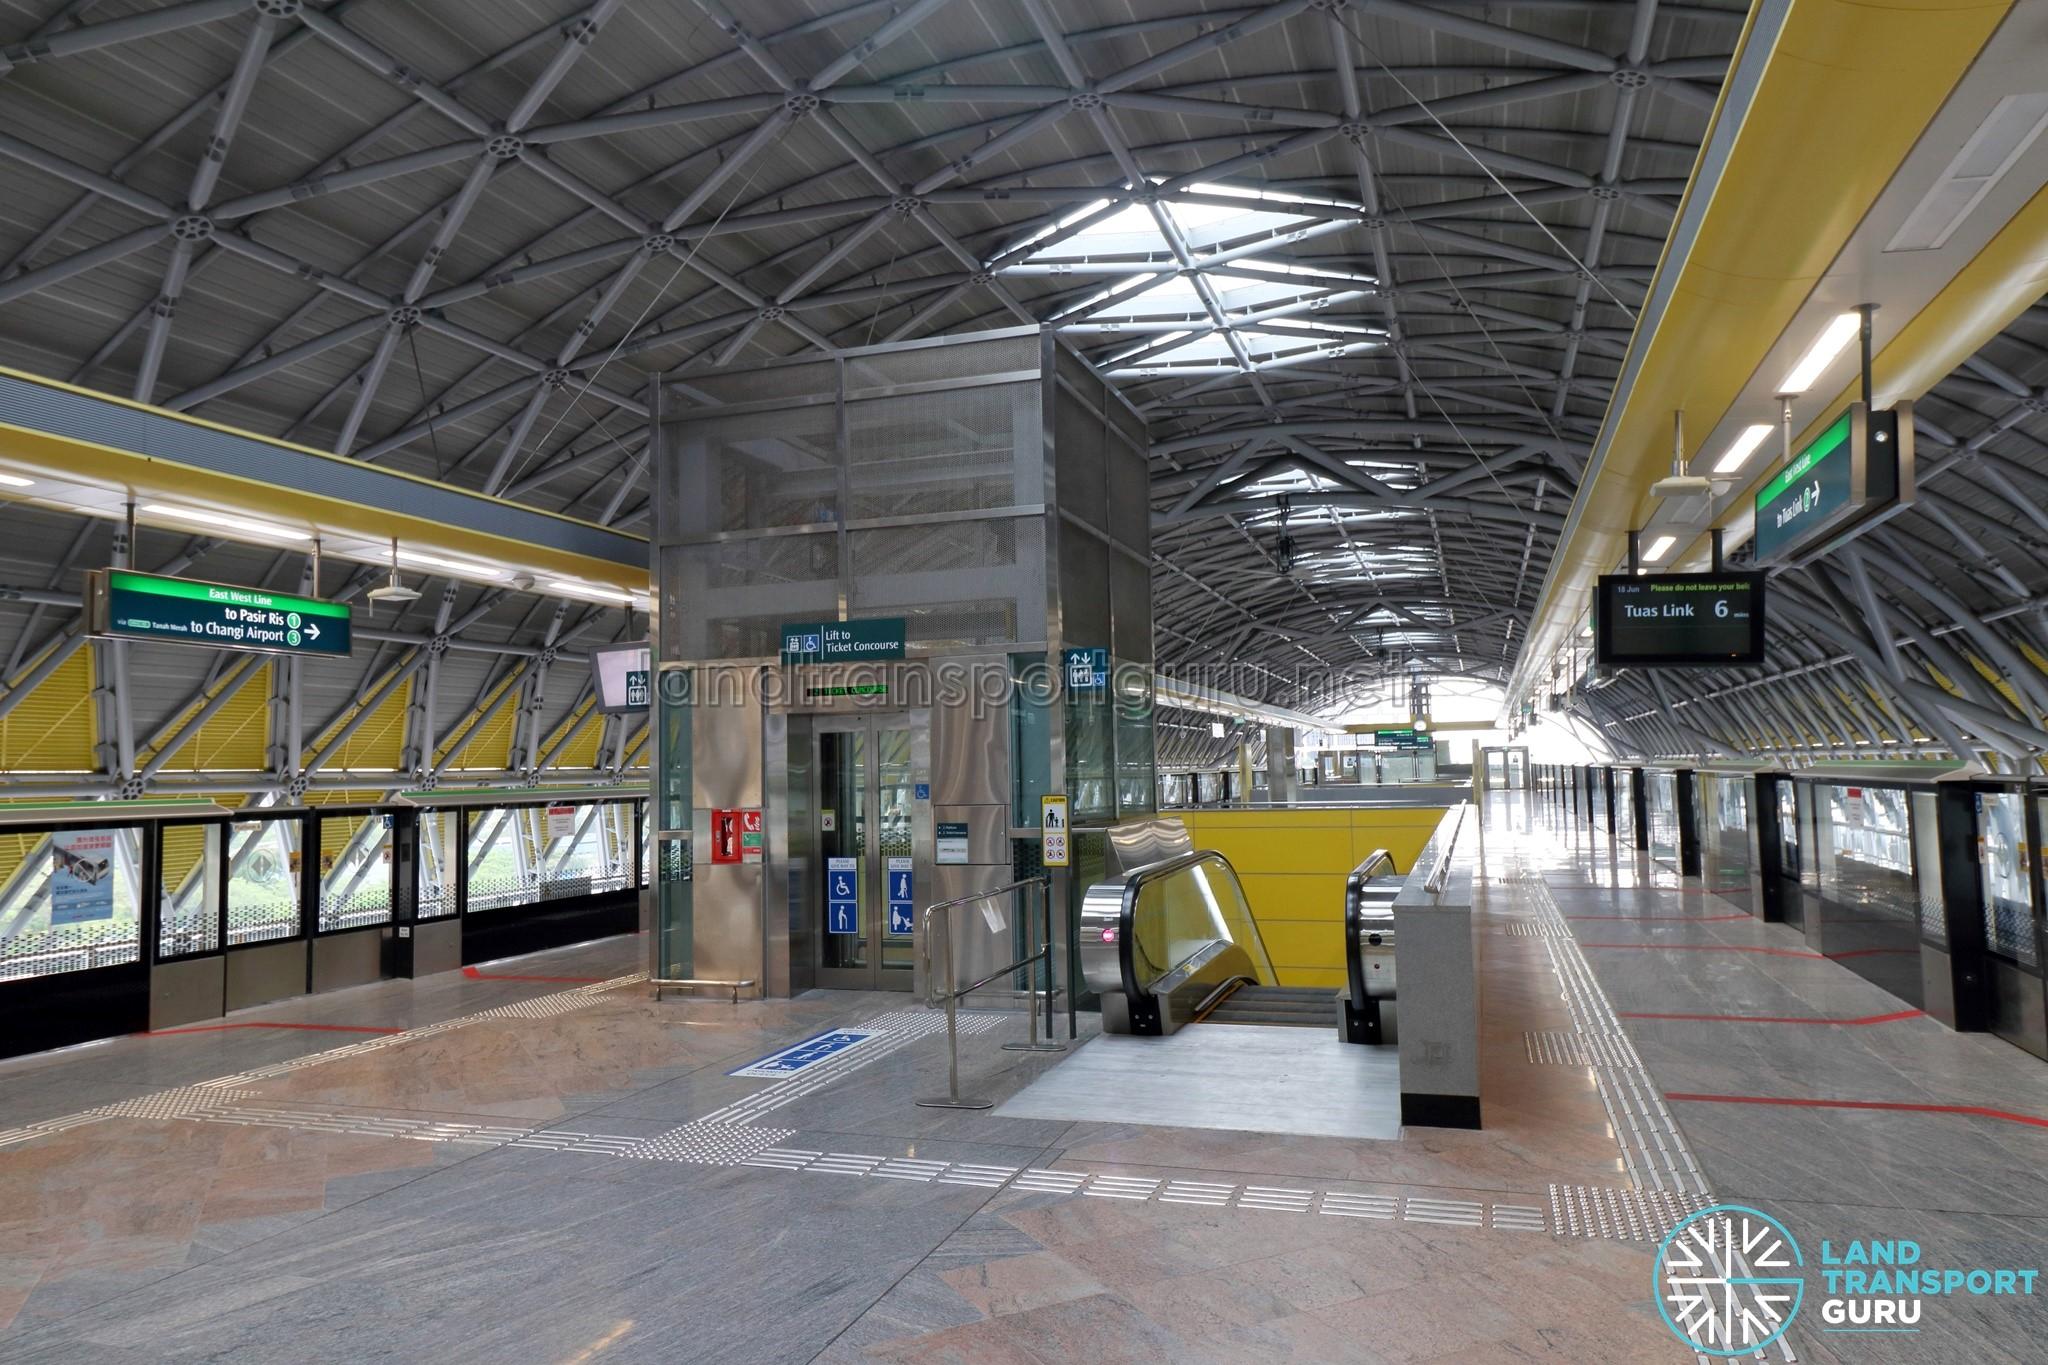 Tuas Crescent Mrt Station Land Transport Guru